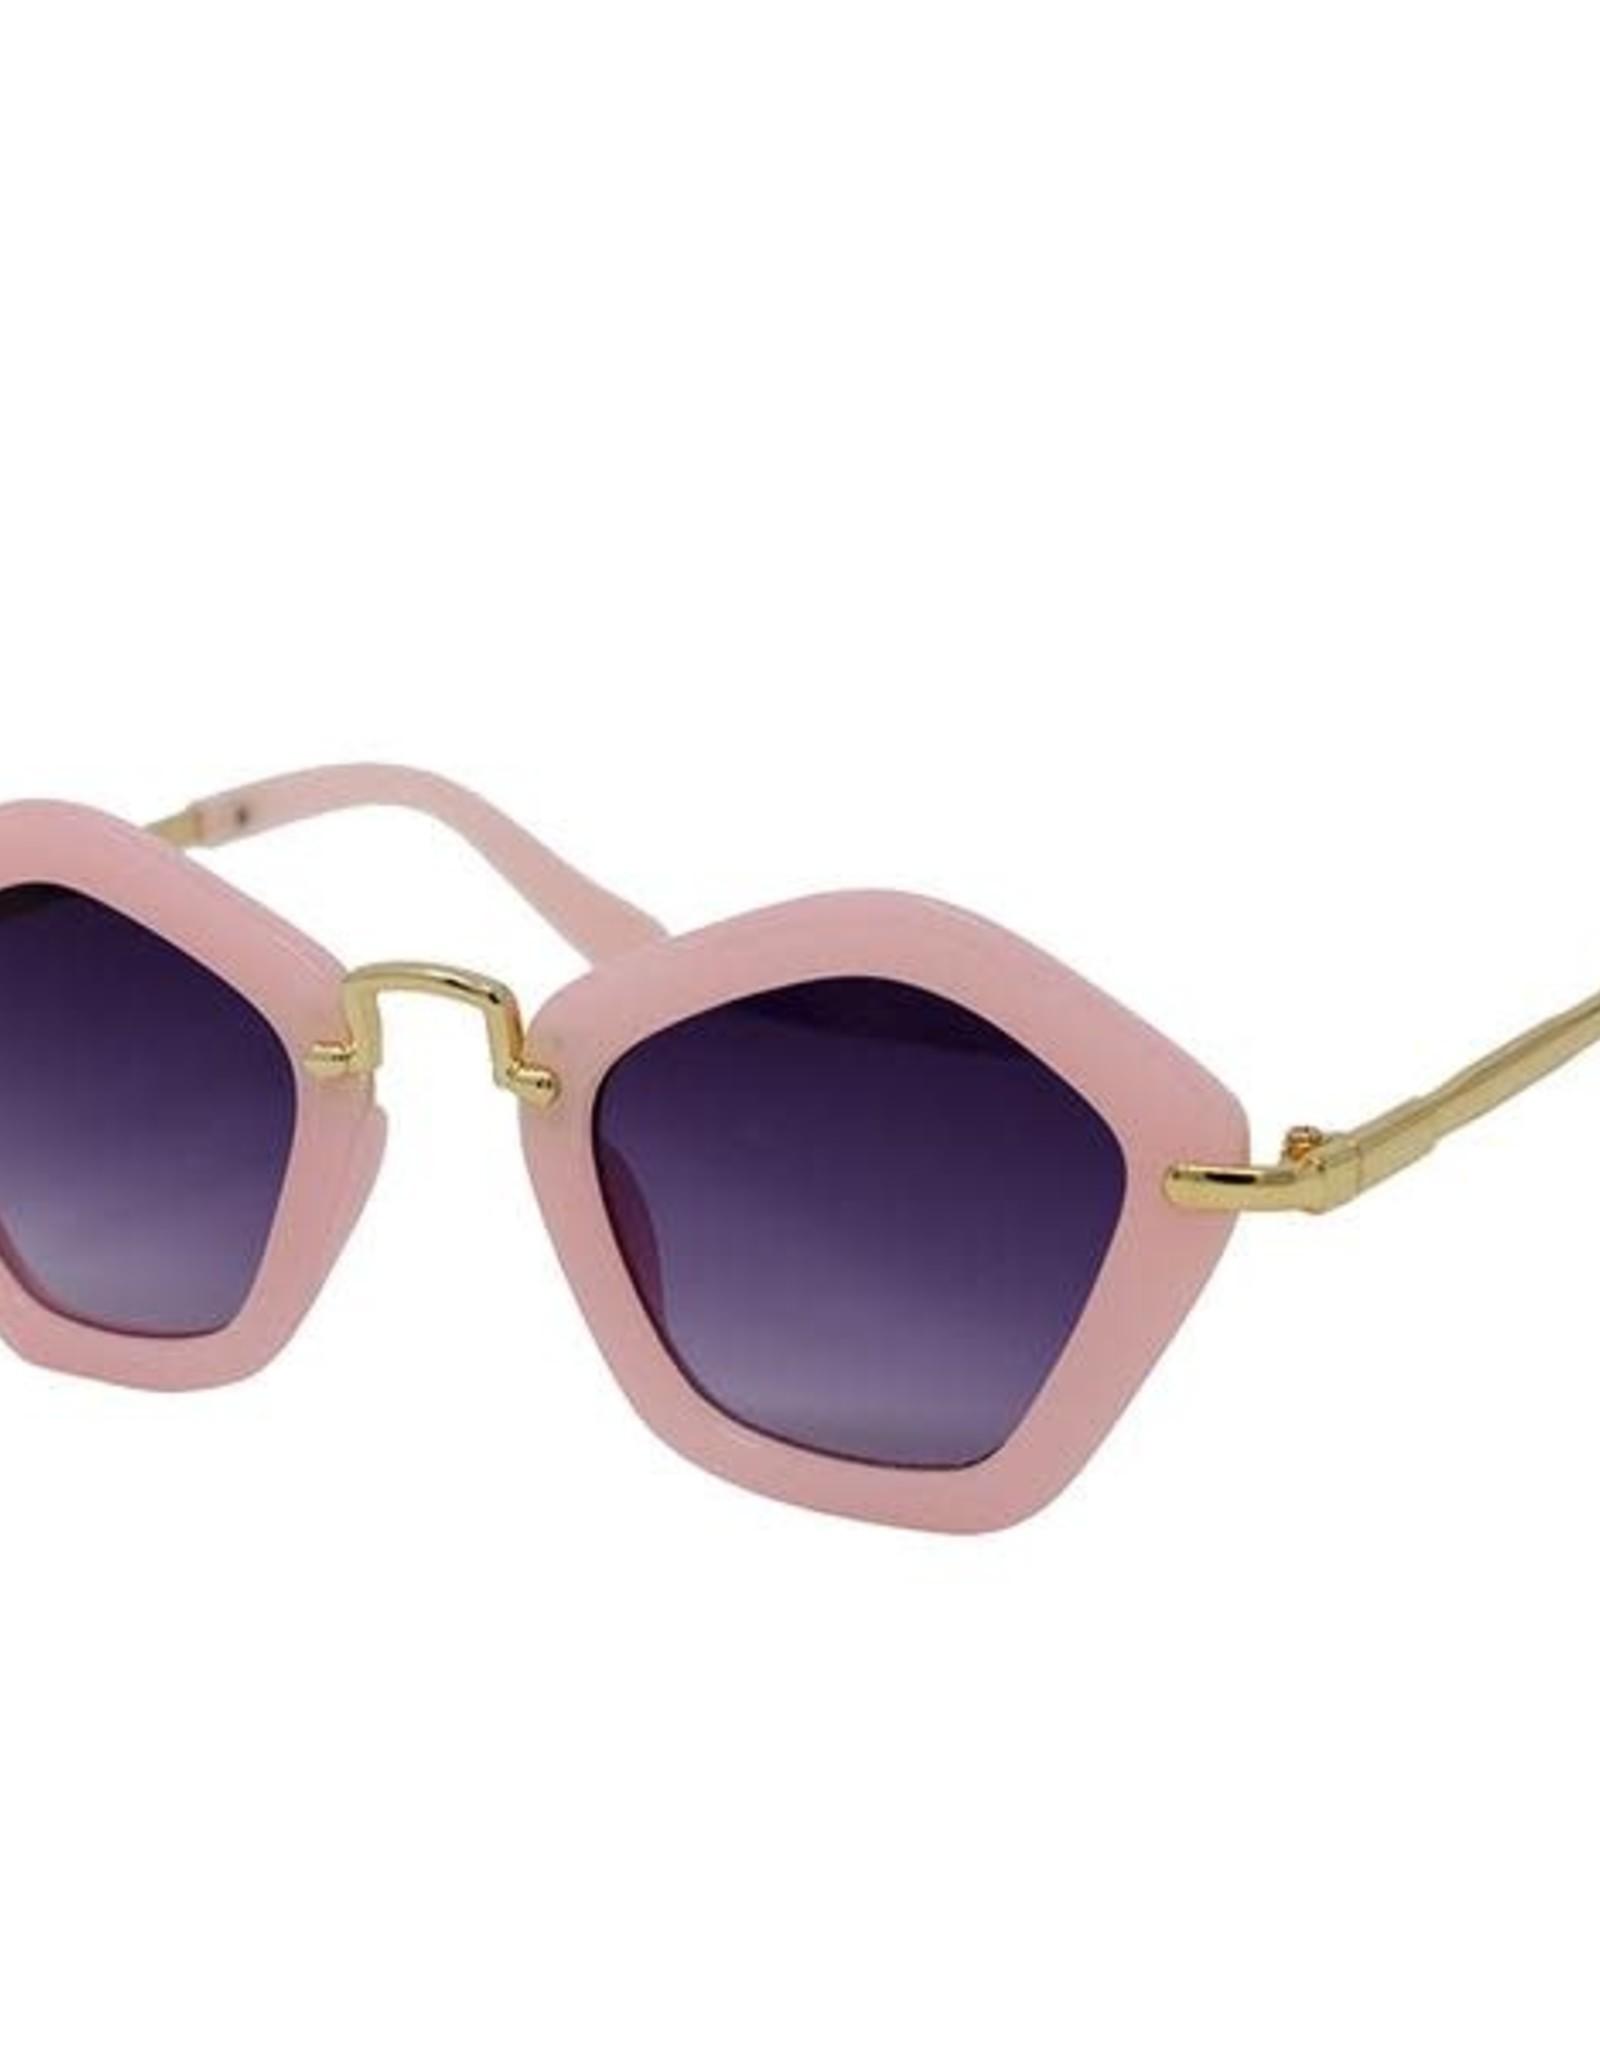 Zomi Gems Pink Polygon Sunglasses